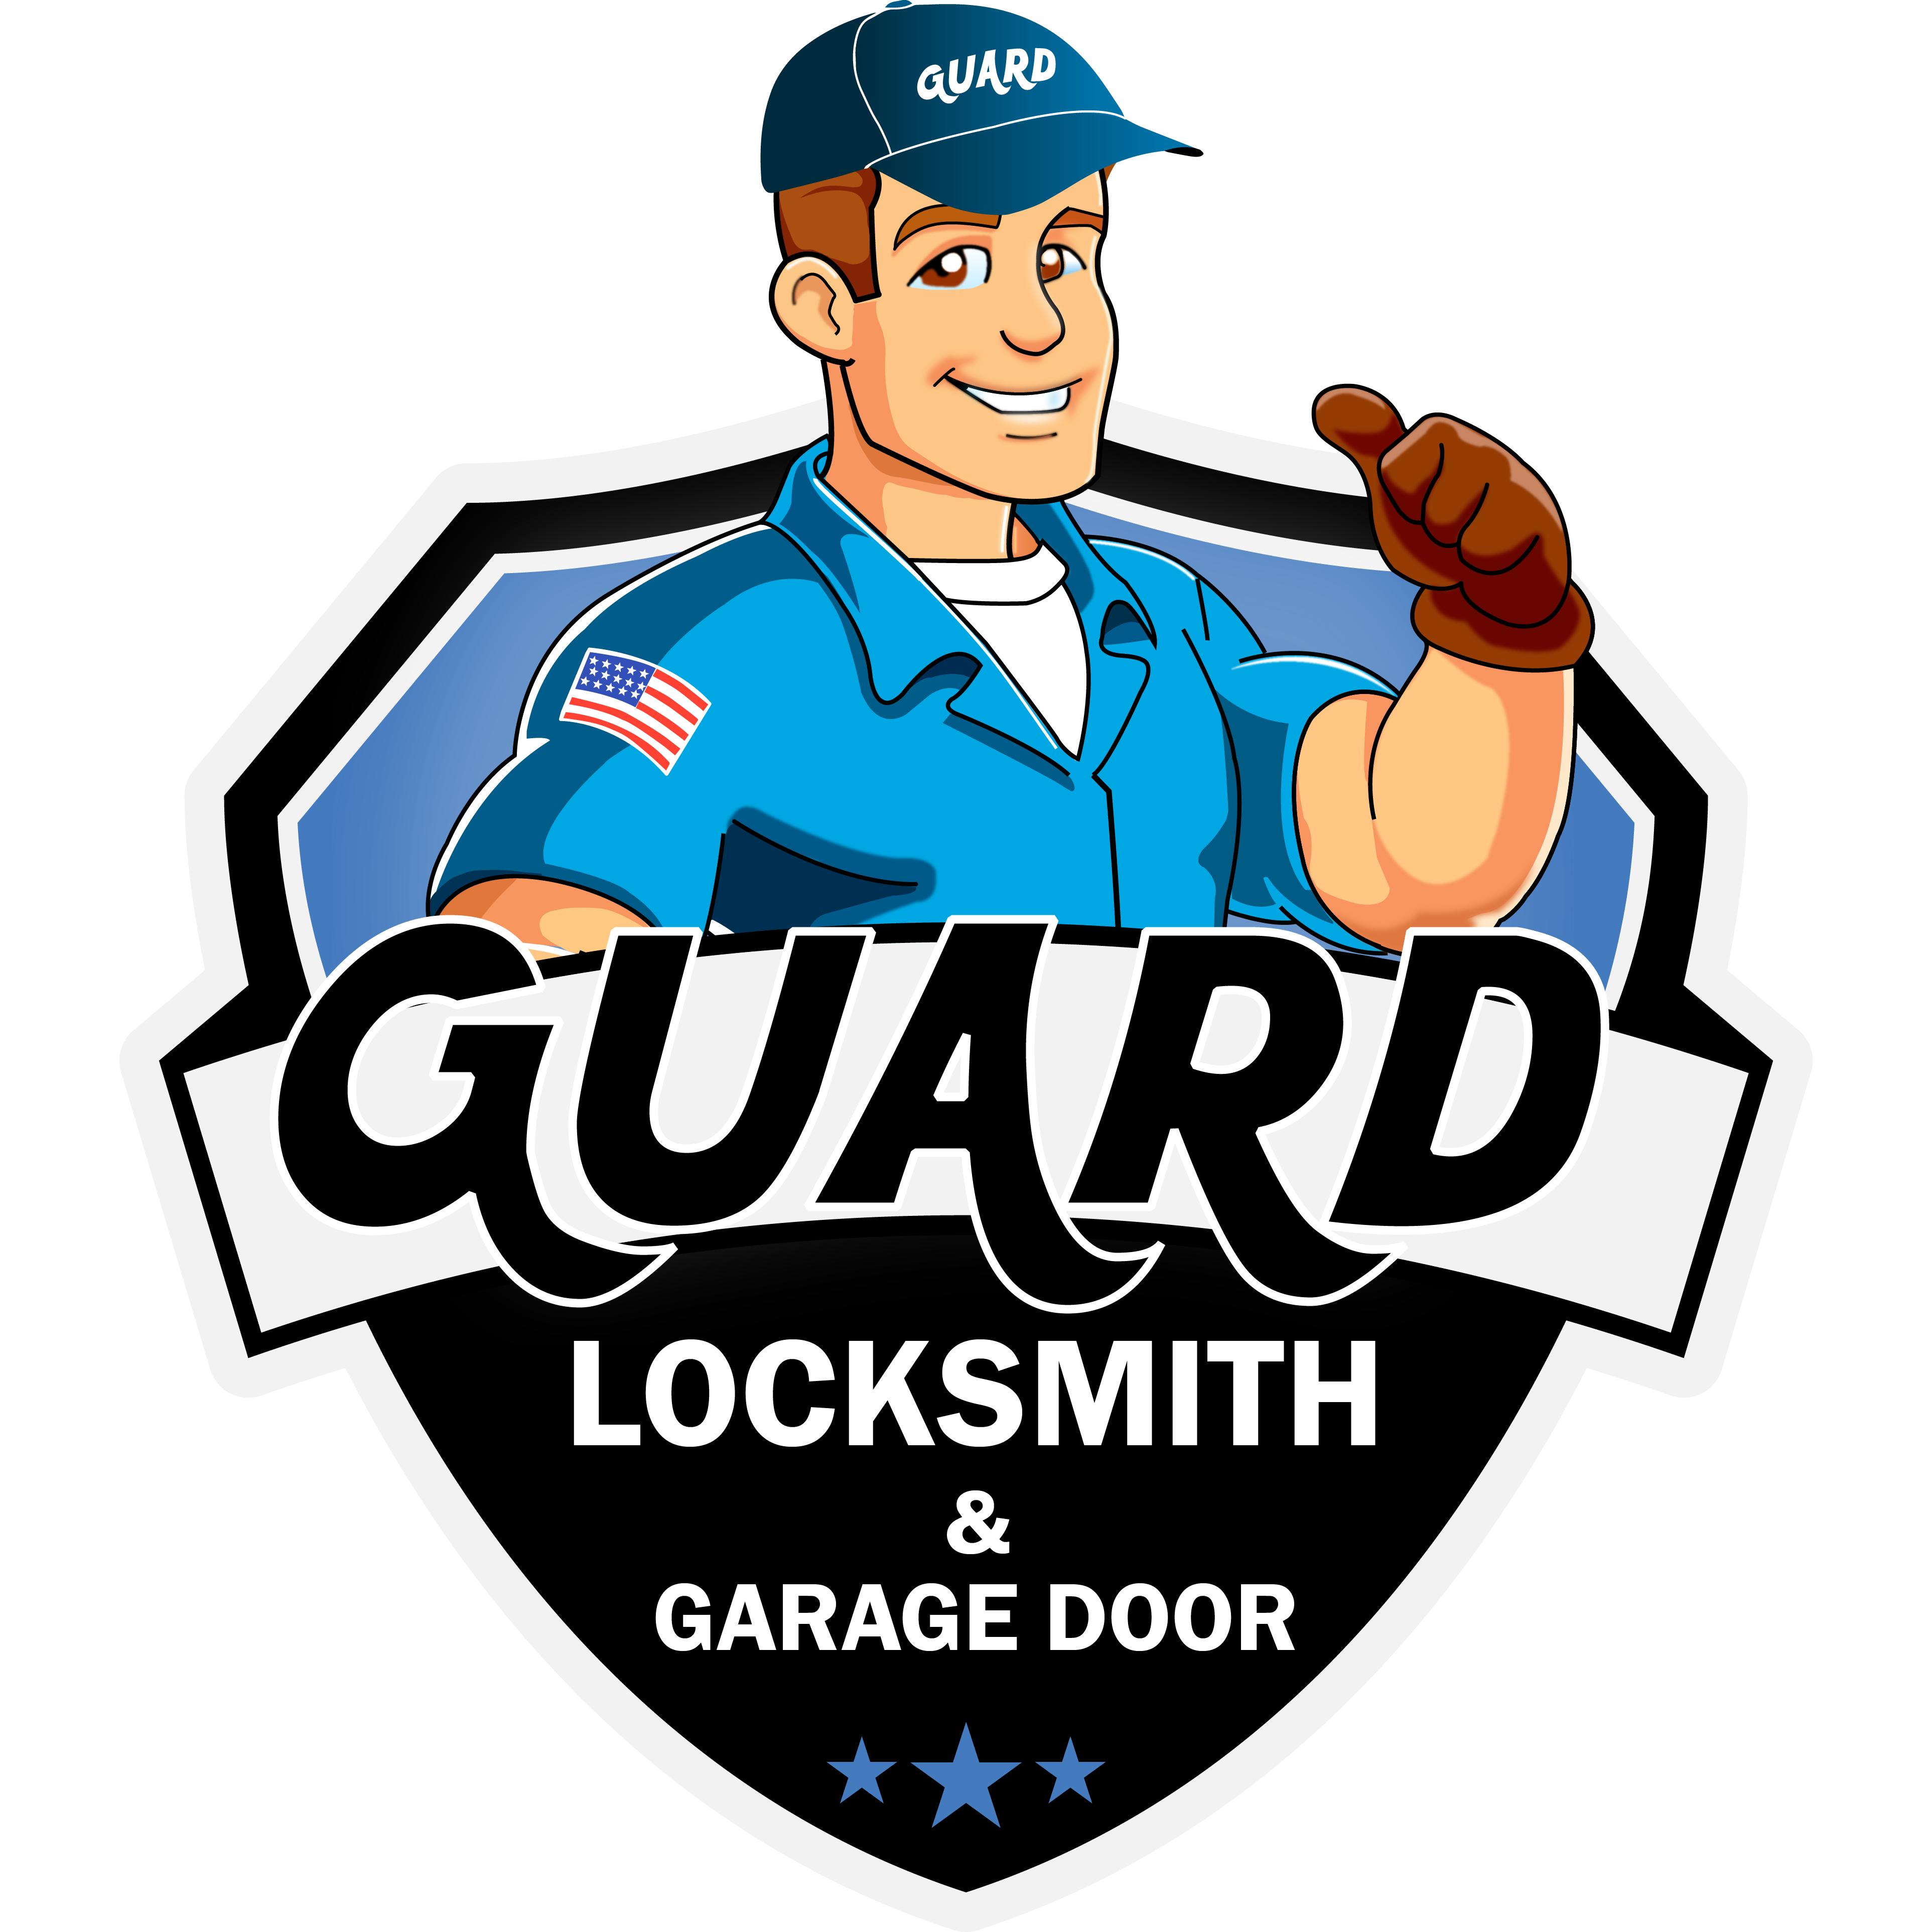 Guard Locksmith & Garage Door Repair Tempe image 1